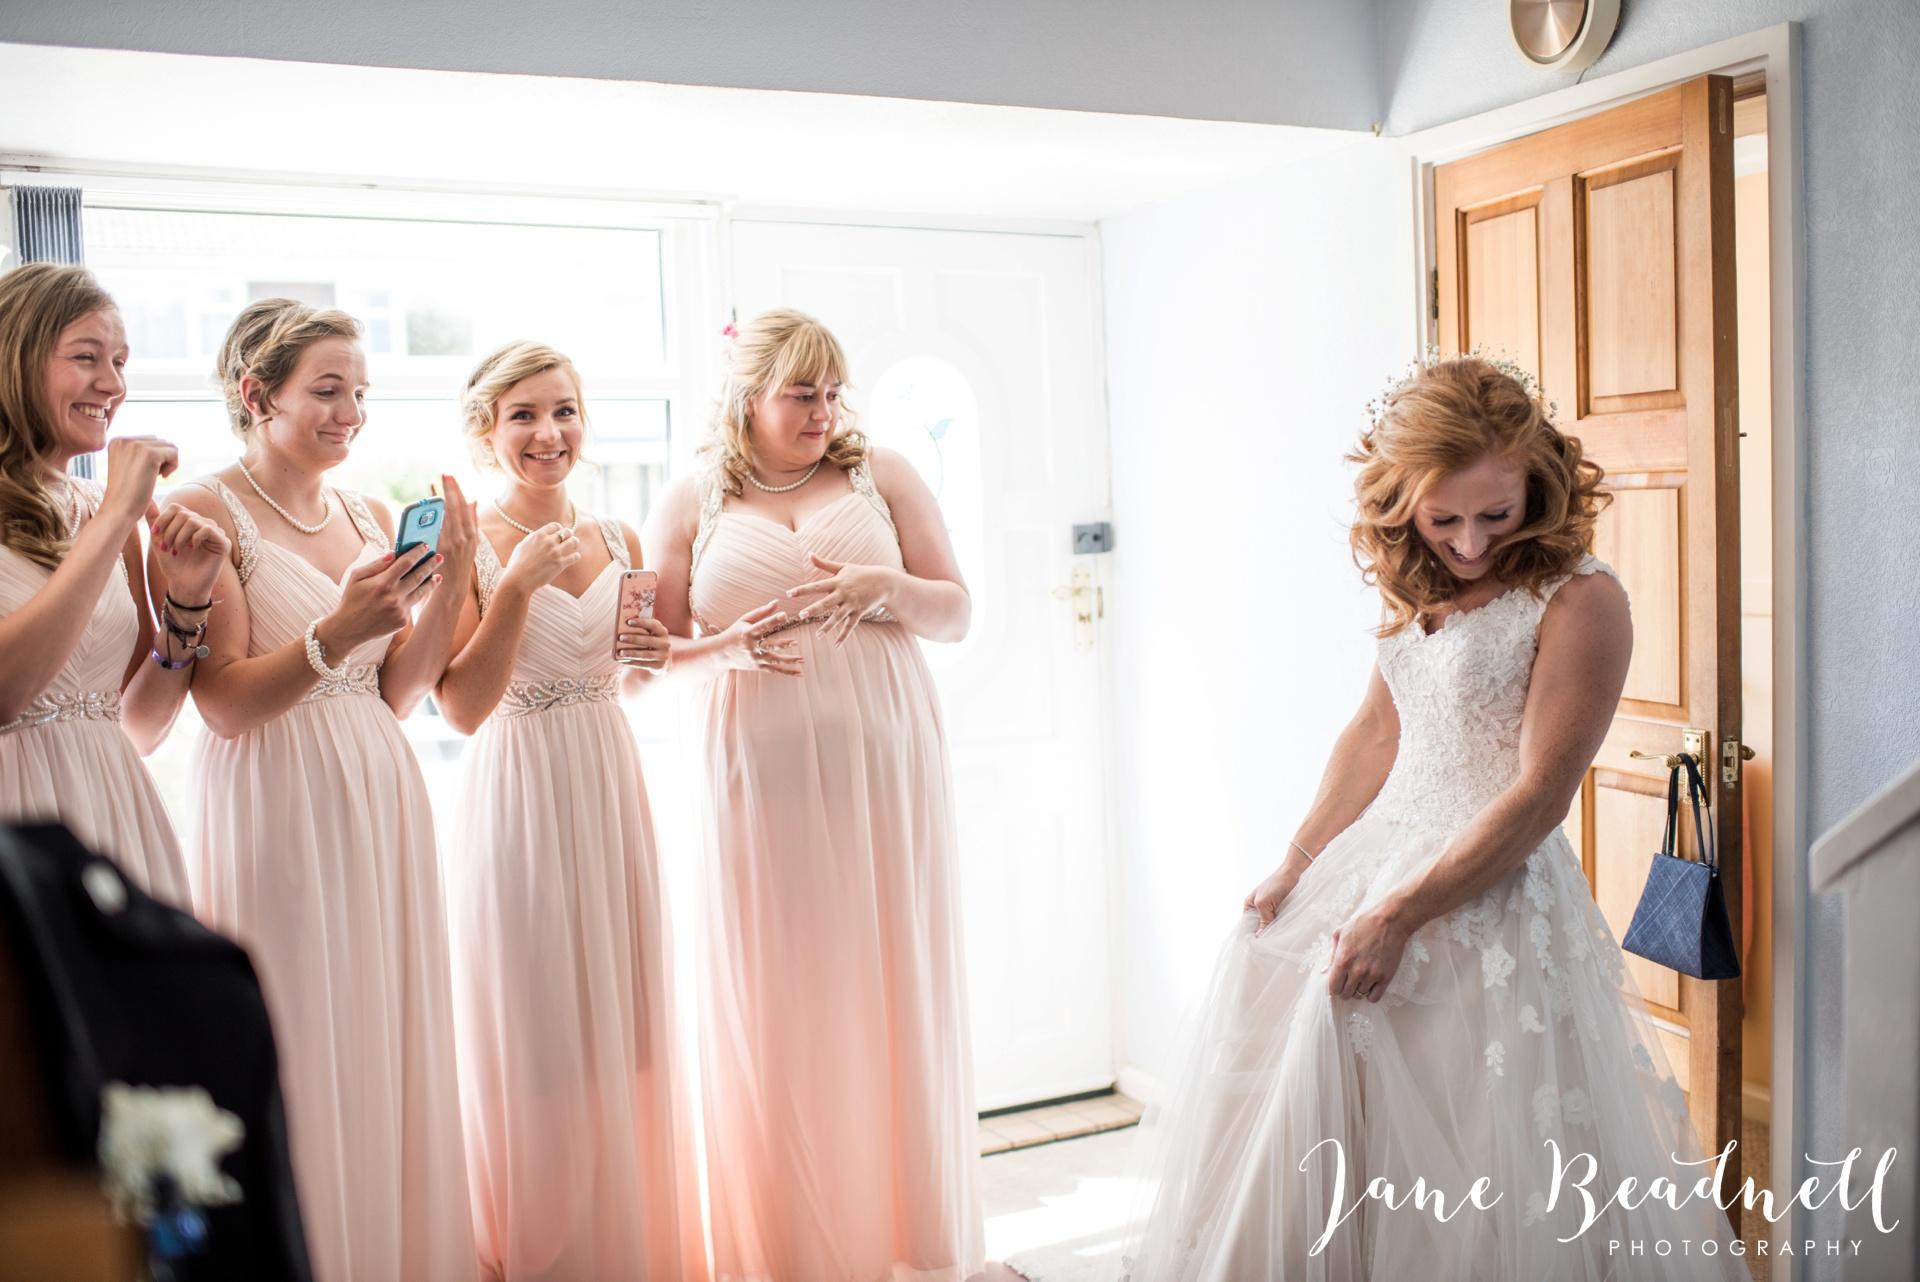 yorkshire-fine-art-wedding-photographer-jane-beadnell-photography-poppleton-york_0013